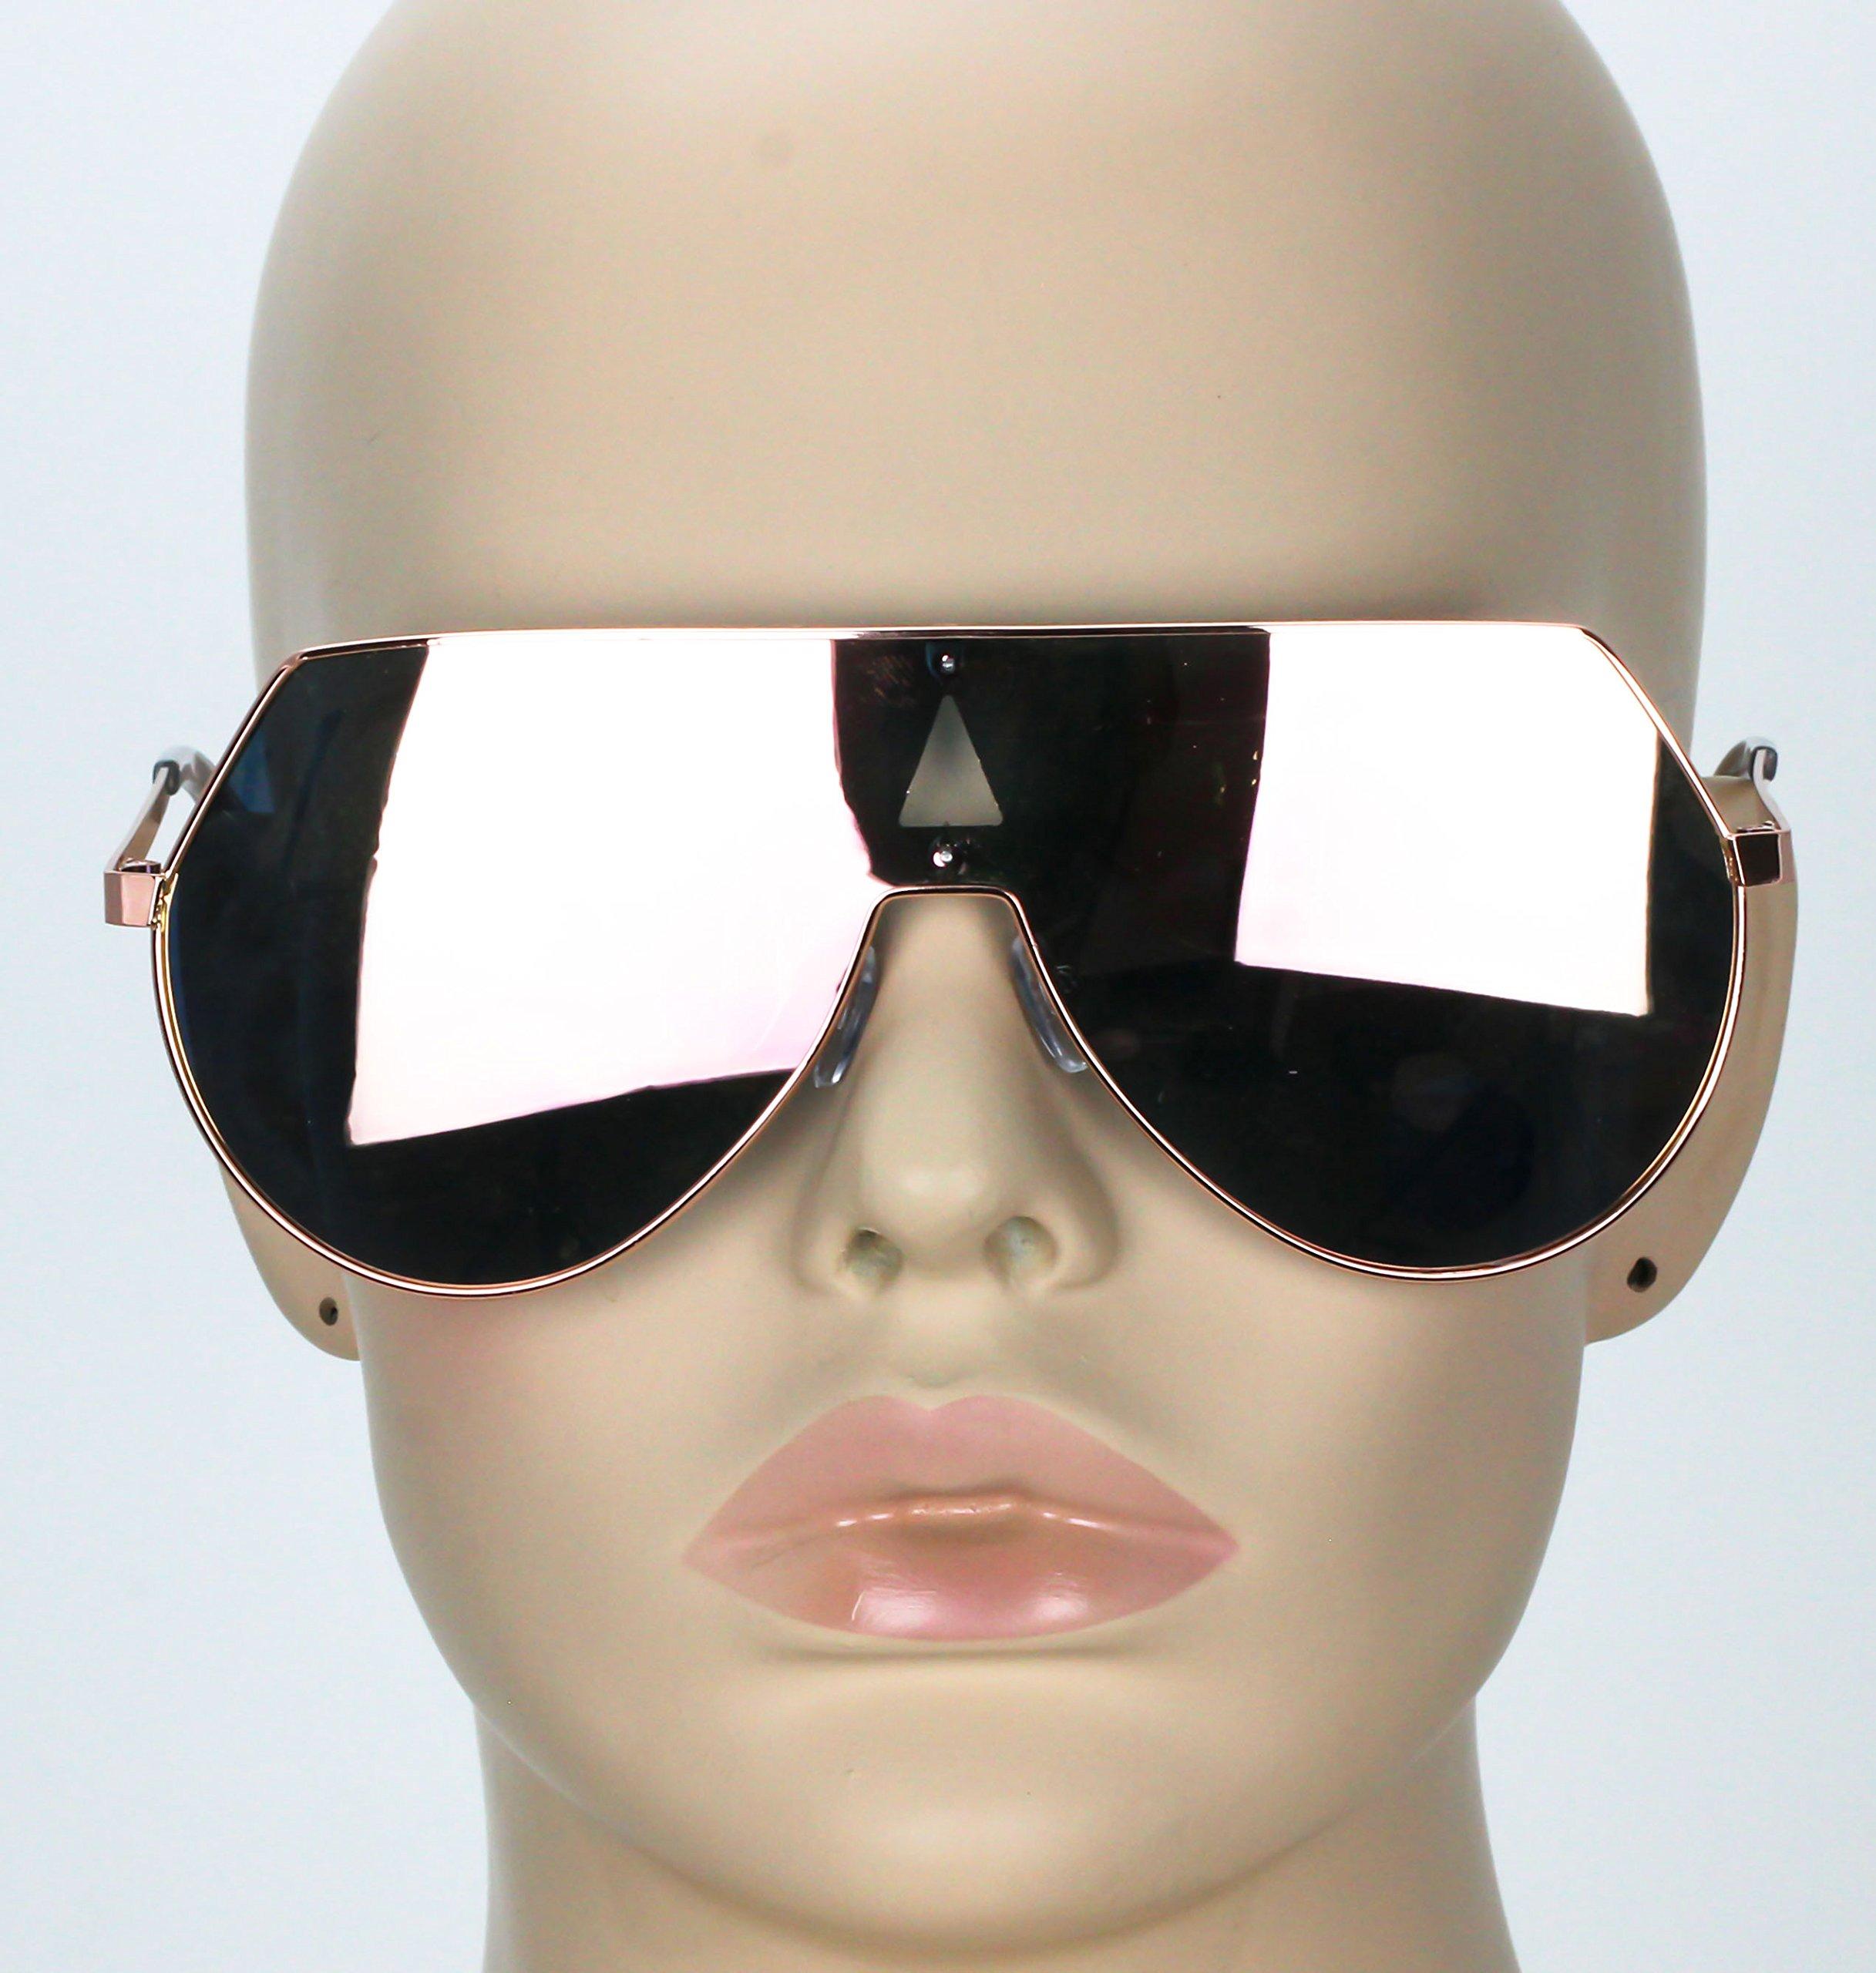 Elite Oversize Unisex Flat Top Aviator Retro Shield Mirrored Lens Rimless Sunglasses (Rose Pink Mirror, 5.8) by EliteGlasses (Image #3)